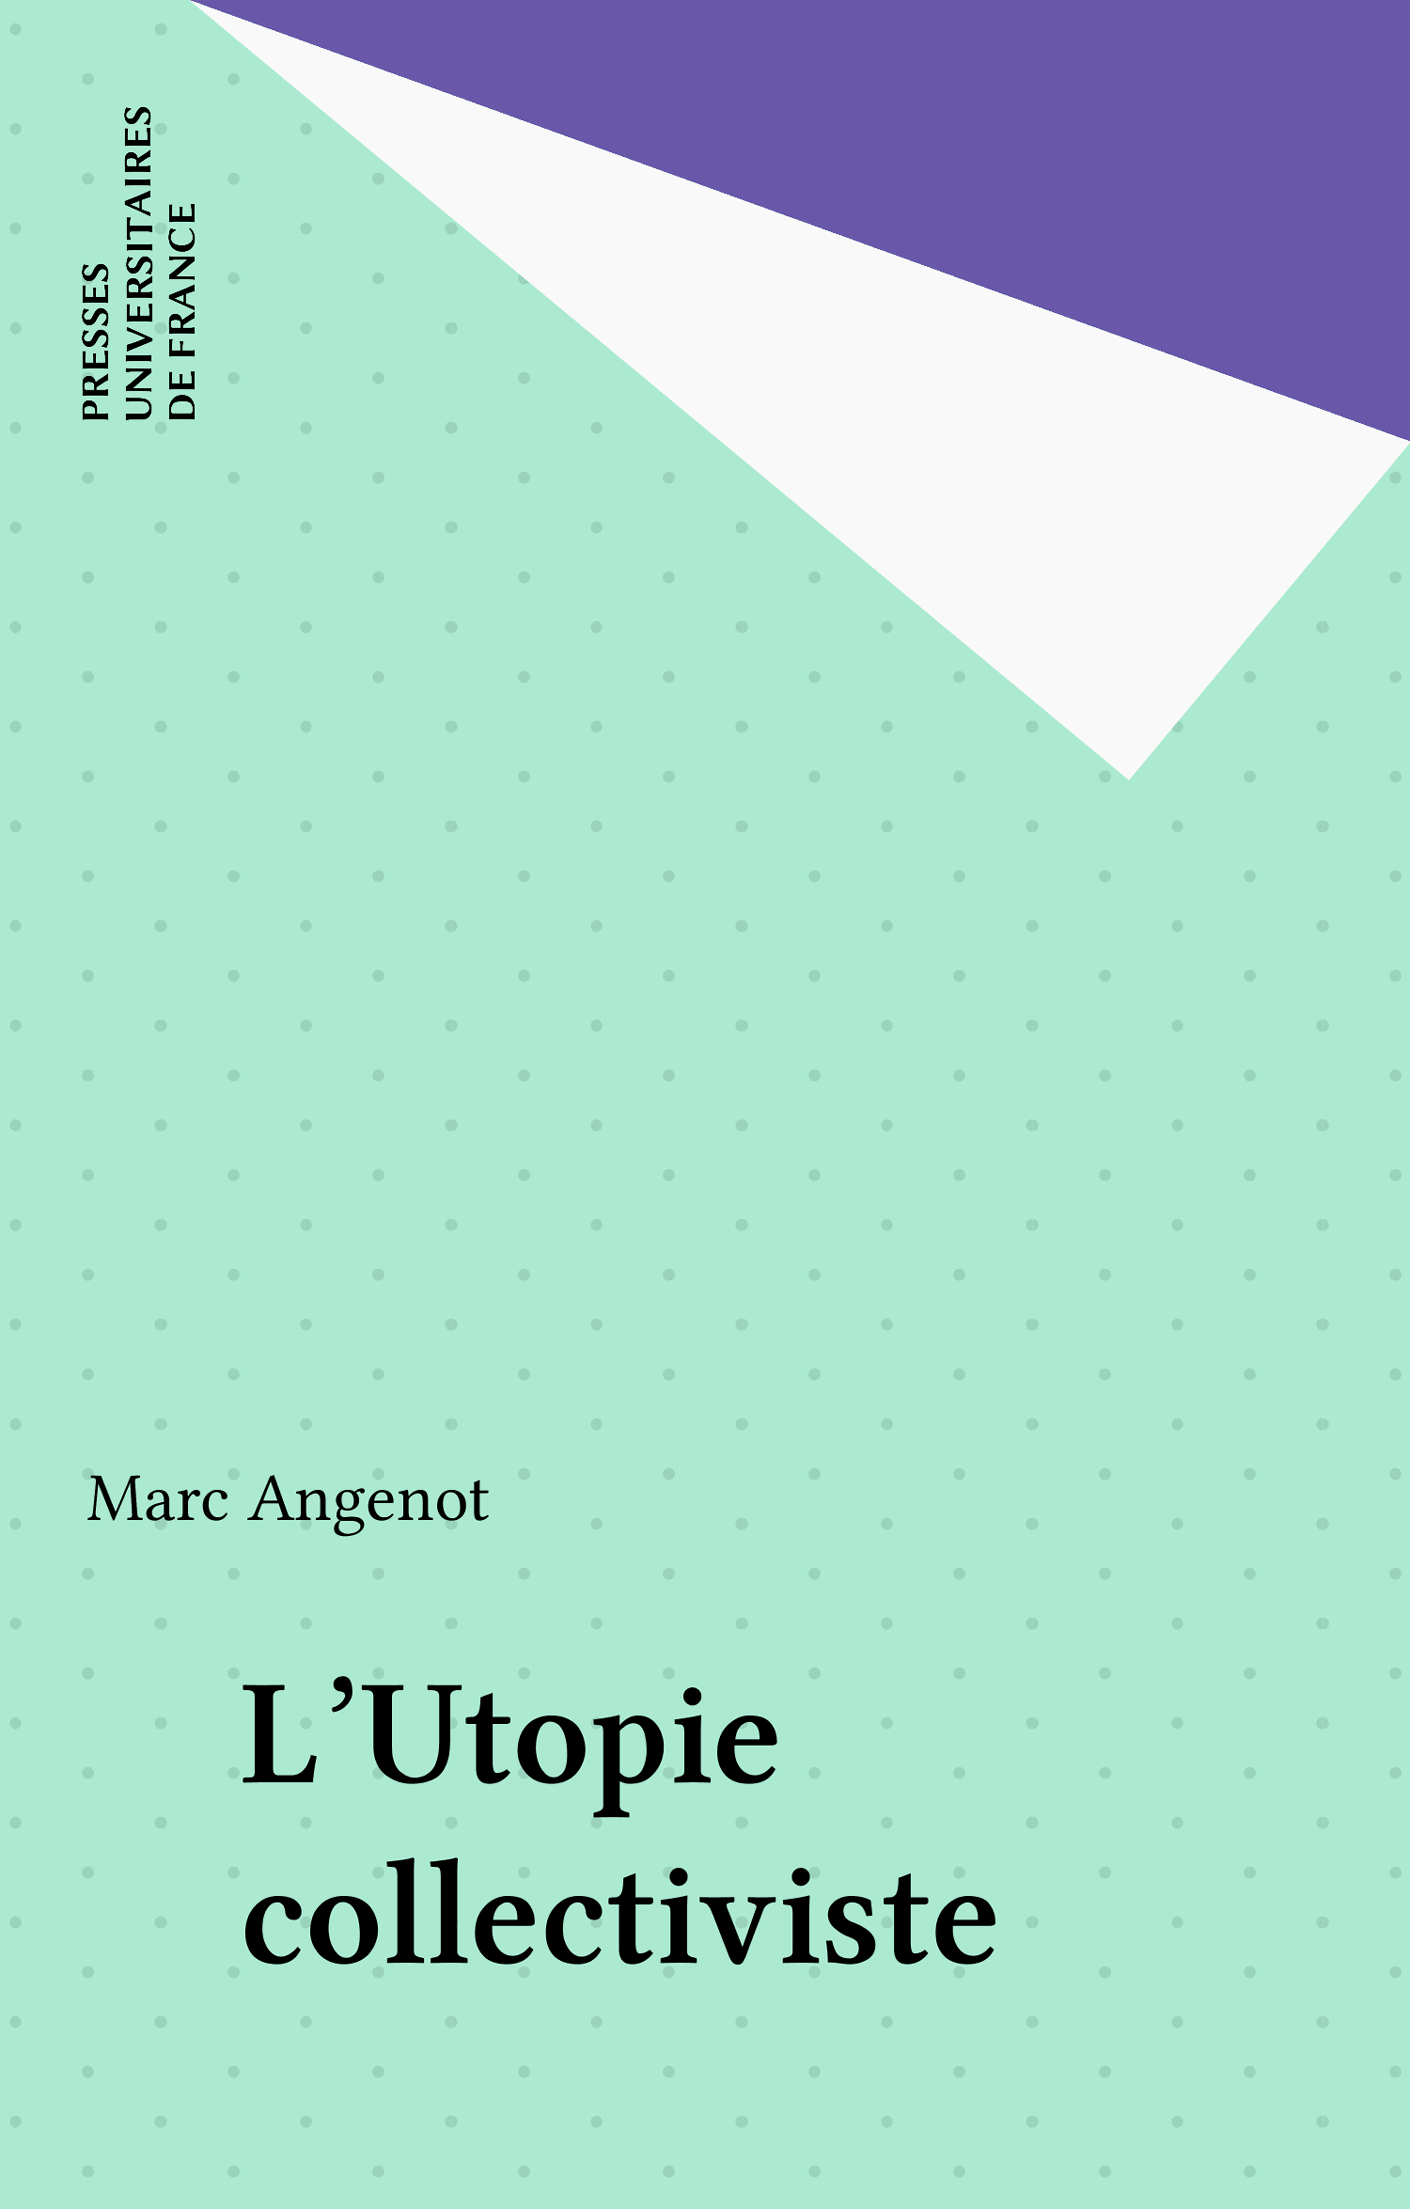 L'Utopie collectiviste